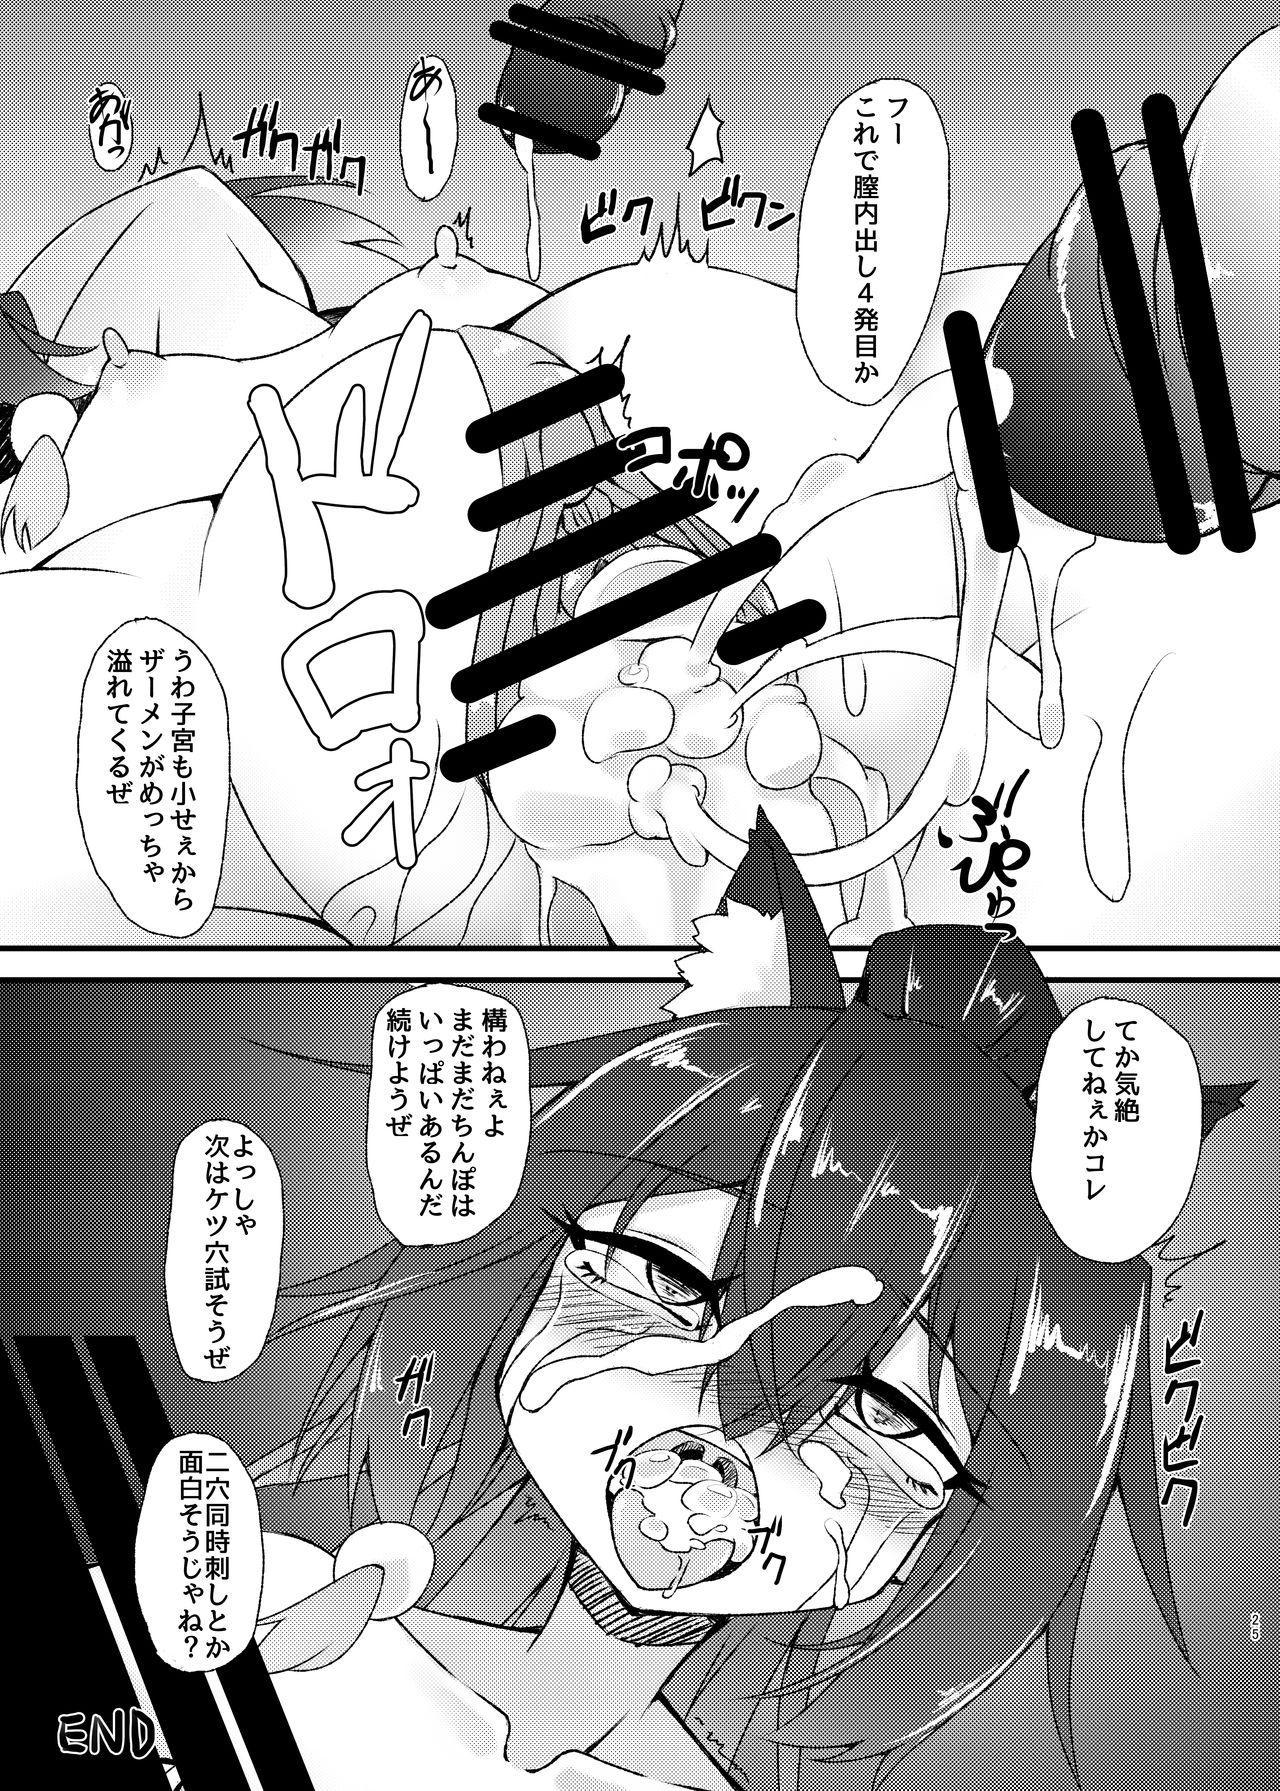 Mizugi no Satsuei datte Itta jan 24